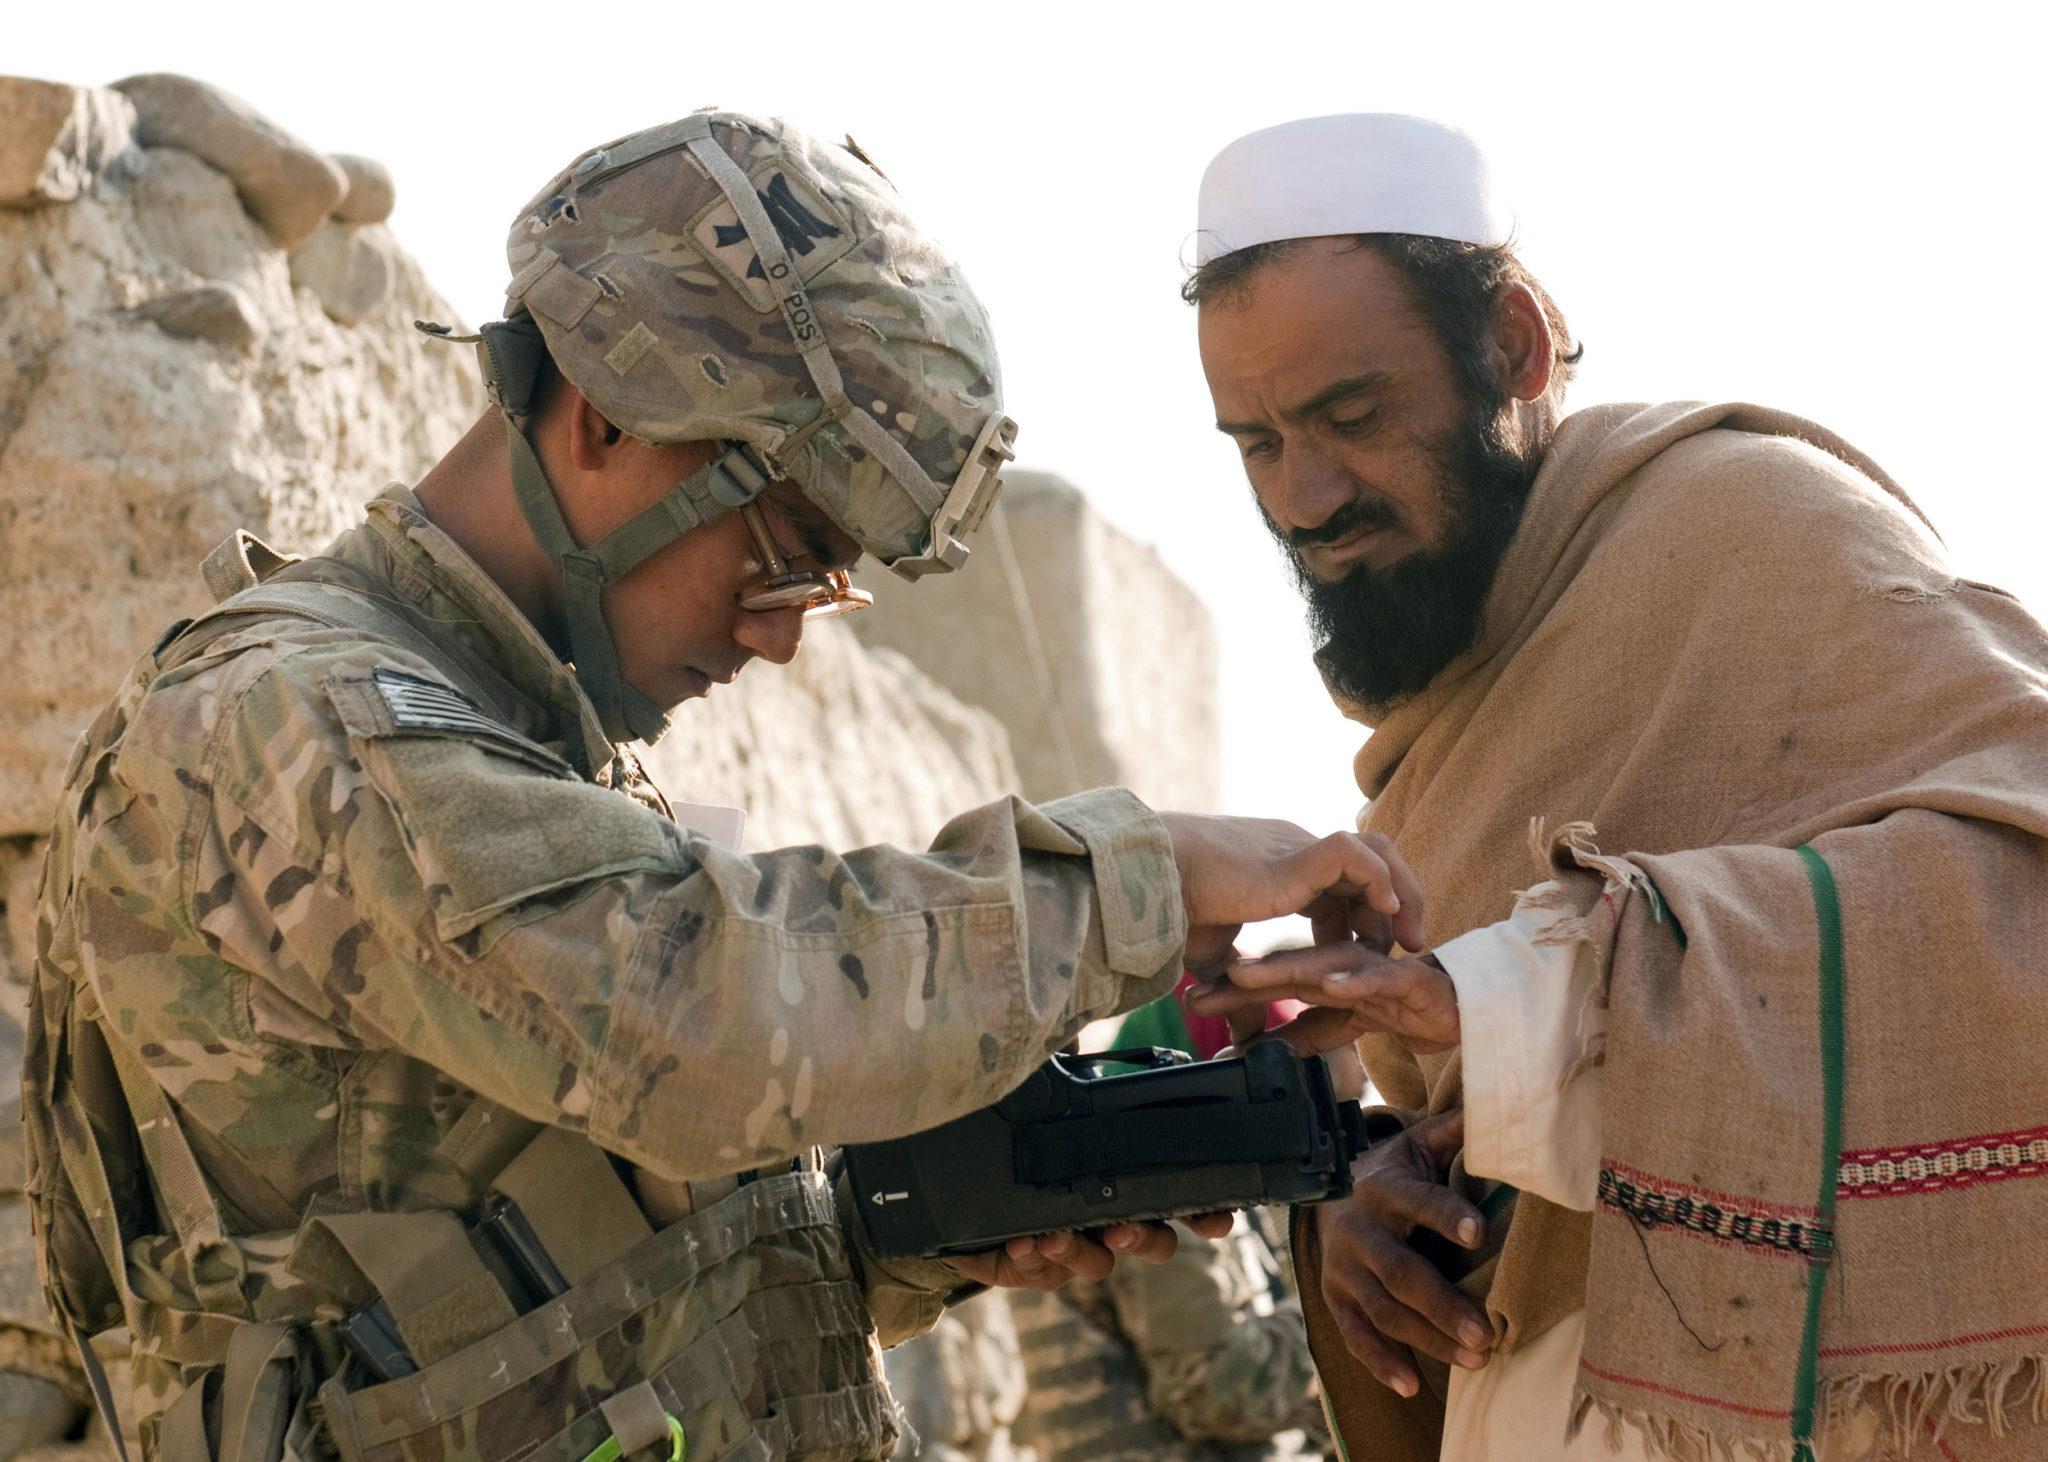 FBI Informant Helped Nab Army Veteran Accused of Bomb Plot